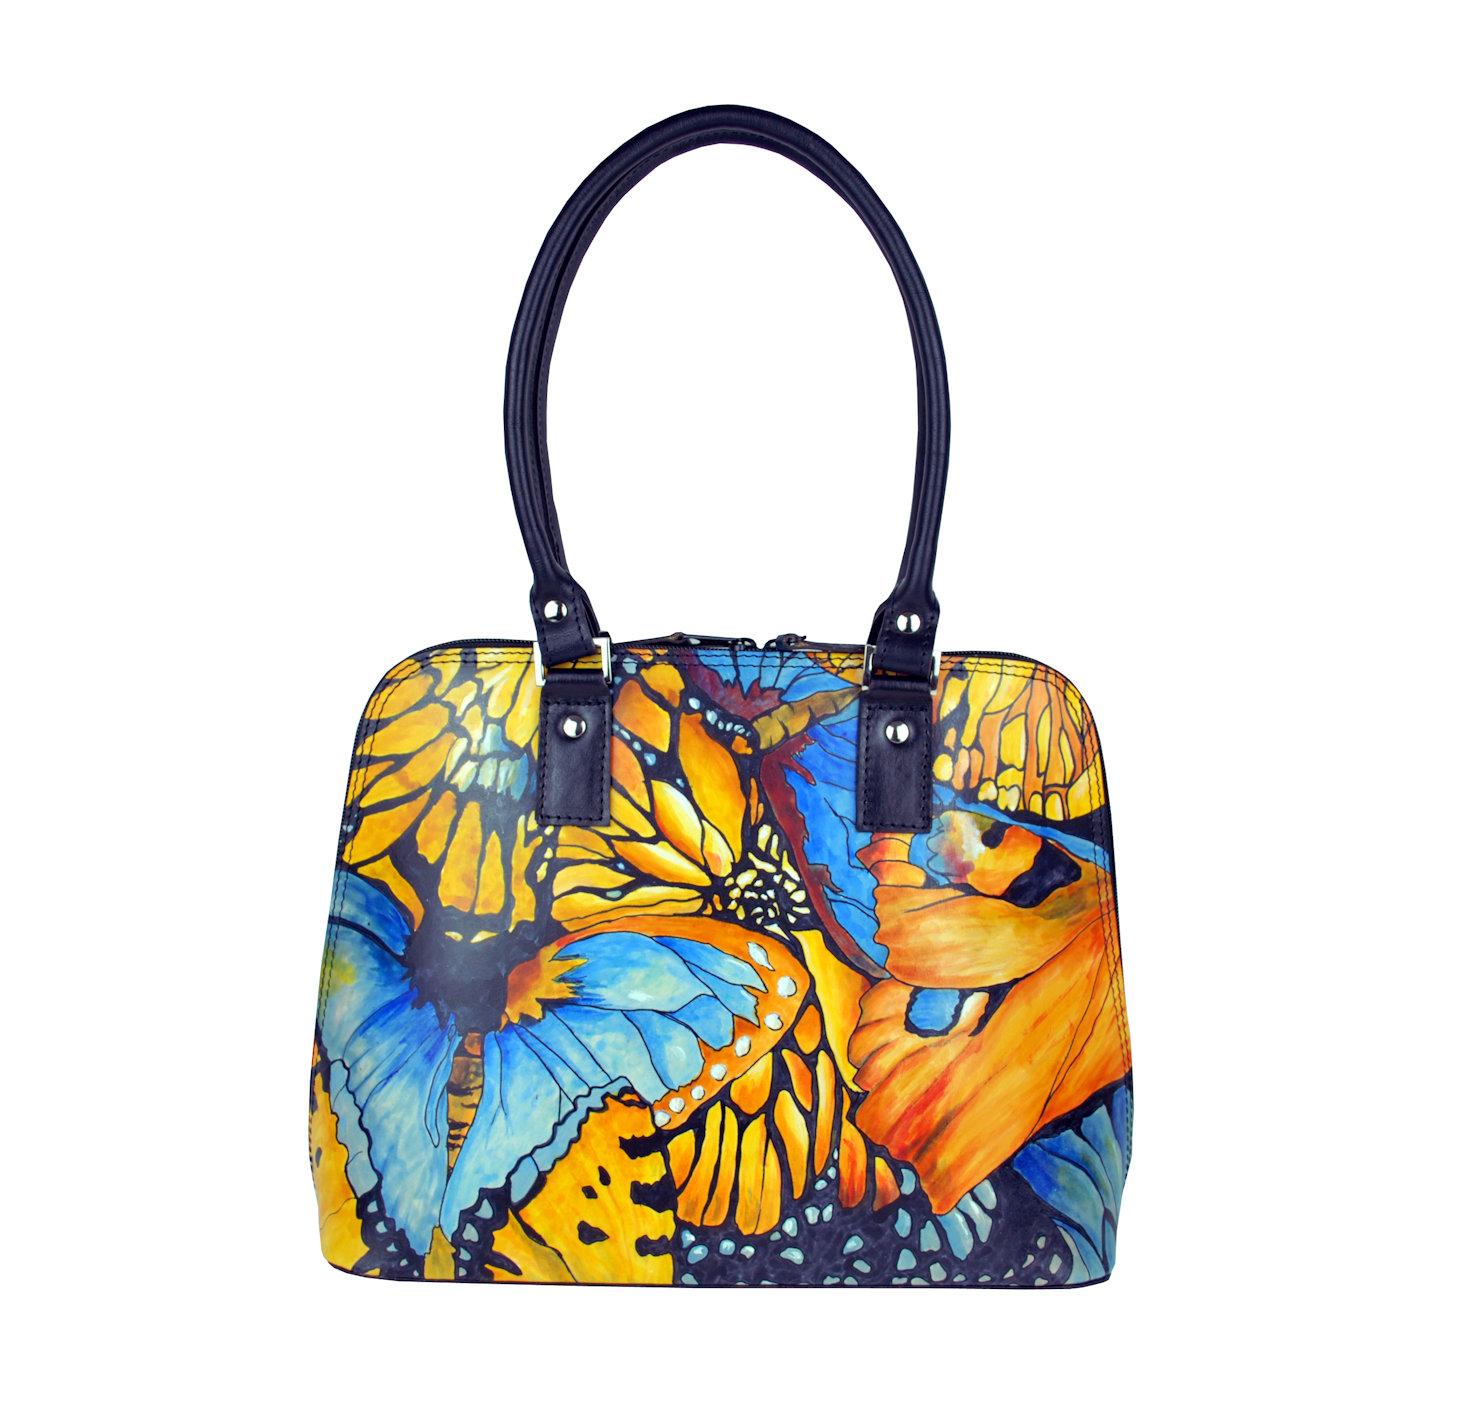 4d401de42b0b Ručne maľovaná kabelka 8573 s motívom Motýľe